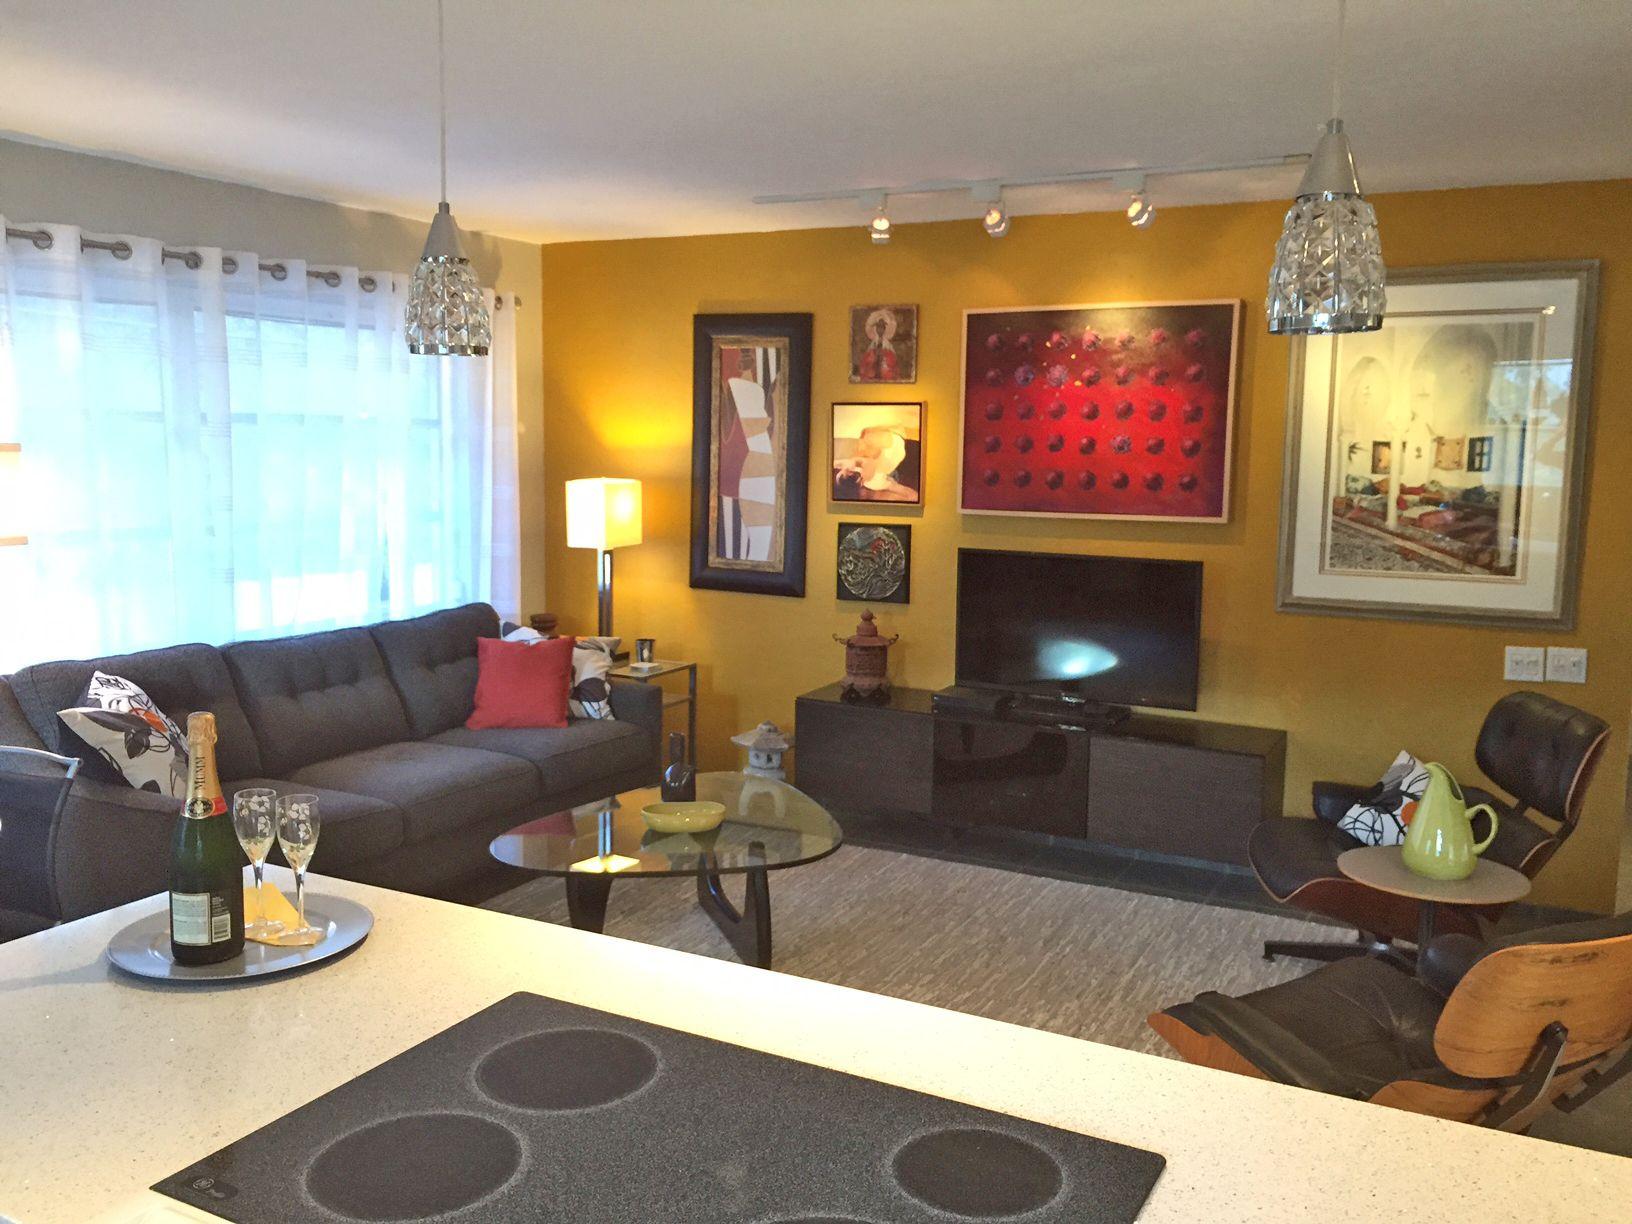 615 S Palm Ave #6, Sarasota, FL 34236 - Recently Sold | Trulia